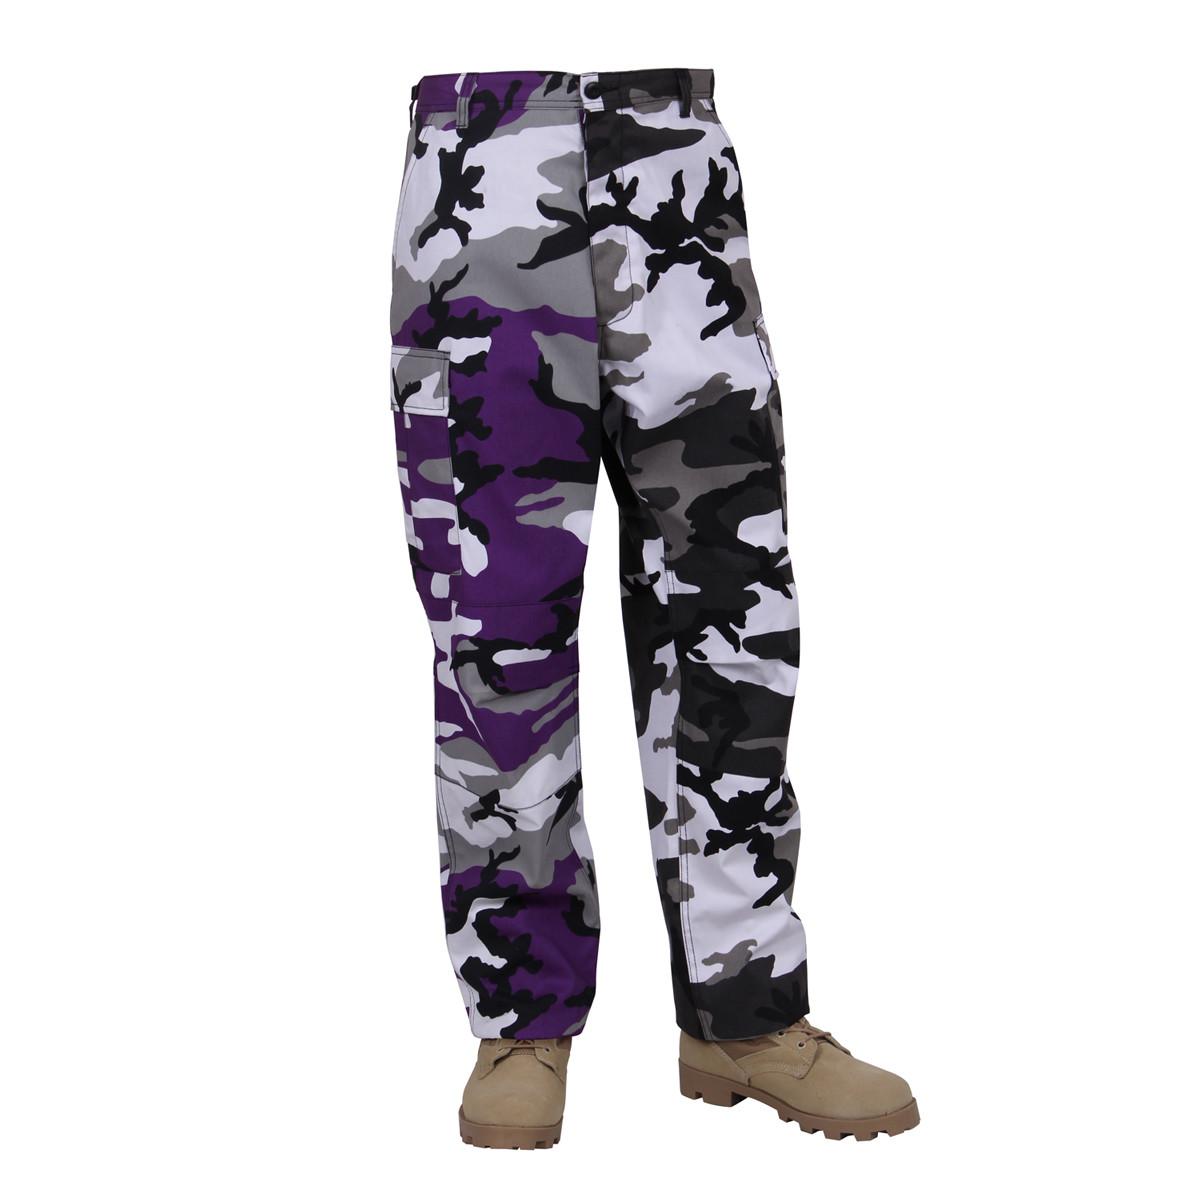 2f5cf5ade5629c Shop Two Tone City Purple Camo Pants - Fatigues Army Navy